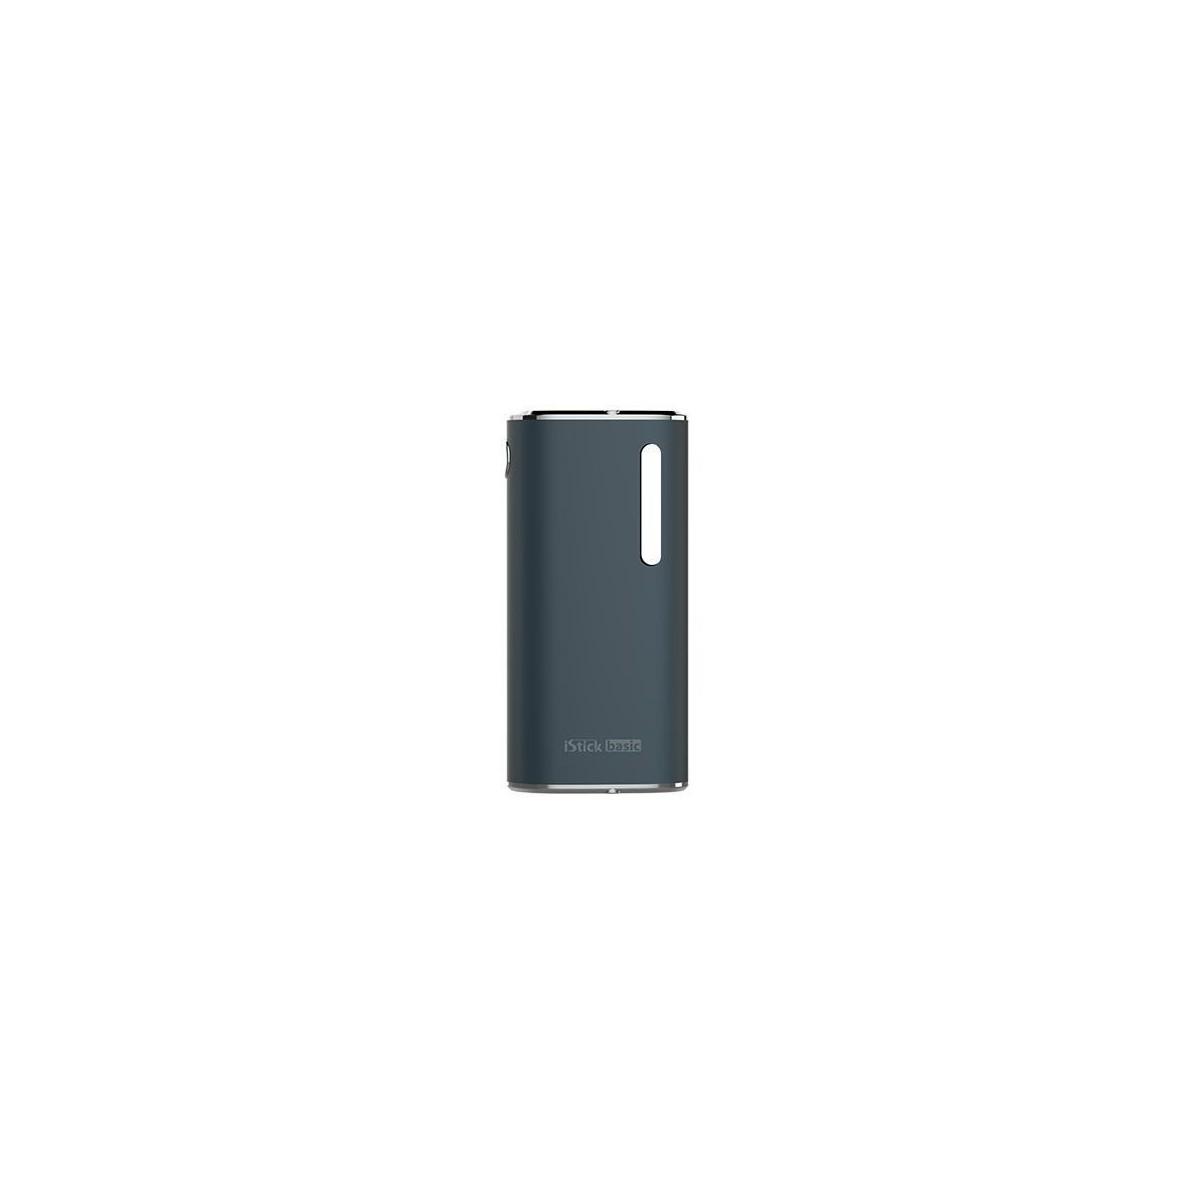 Batteria Istick Basic 2300mAh